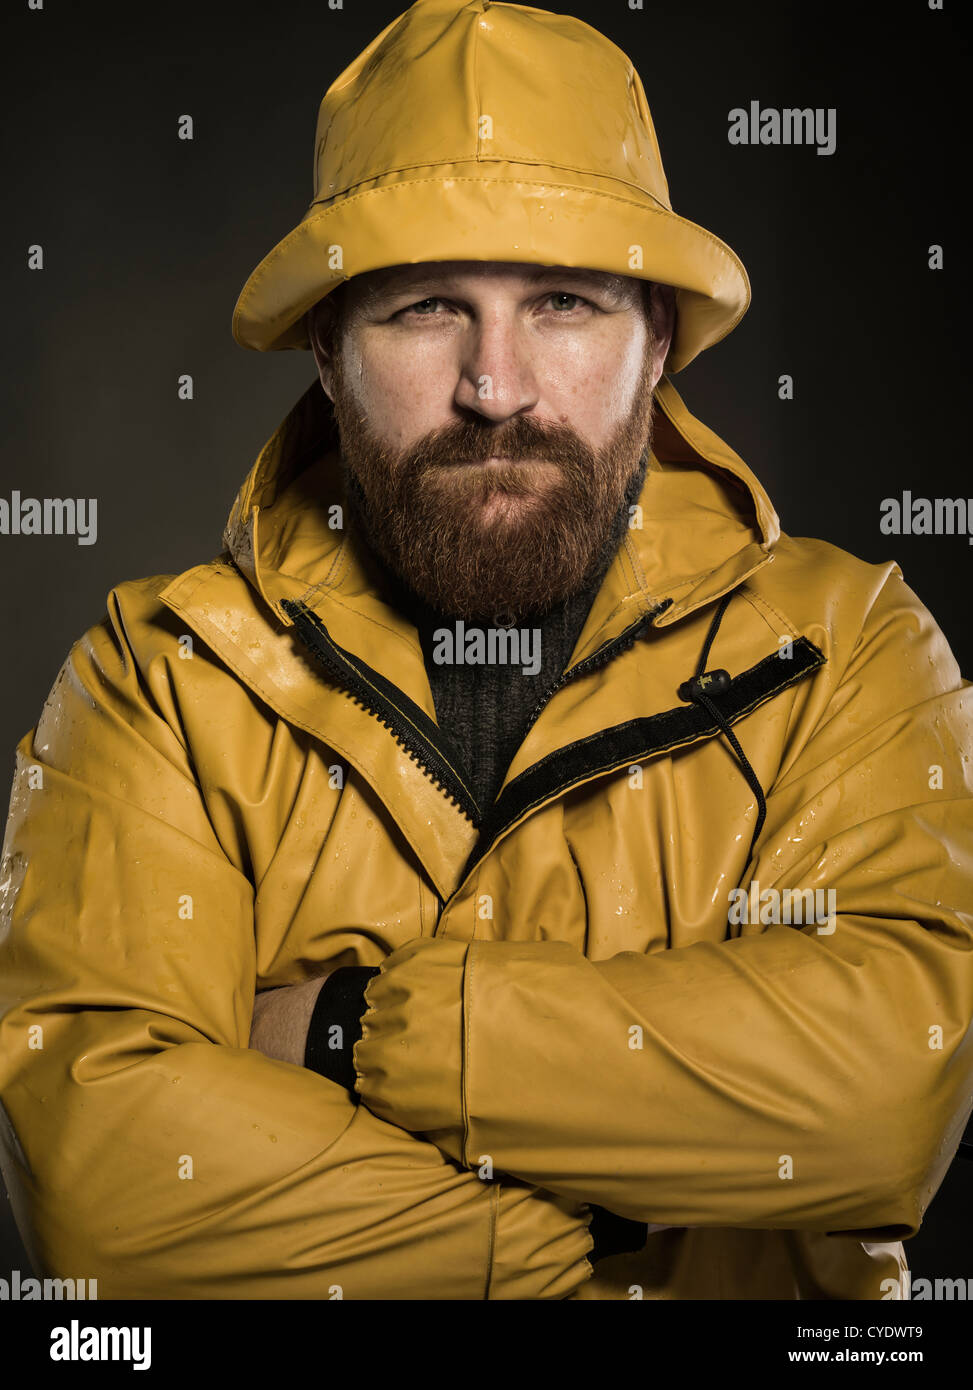 5d289fd4317 fisherman wearing yellow sou wester oilskin - Stock Image